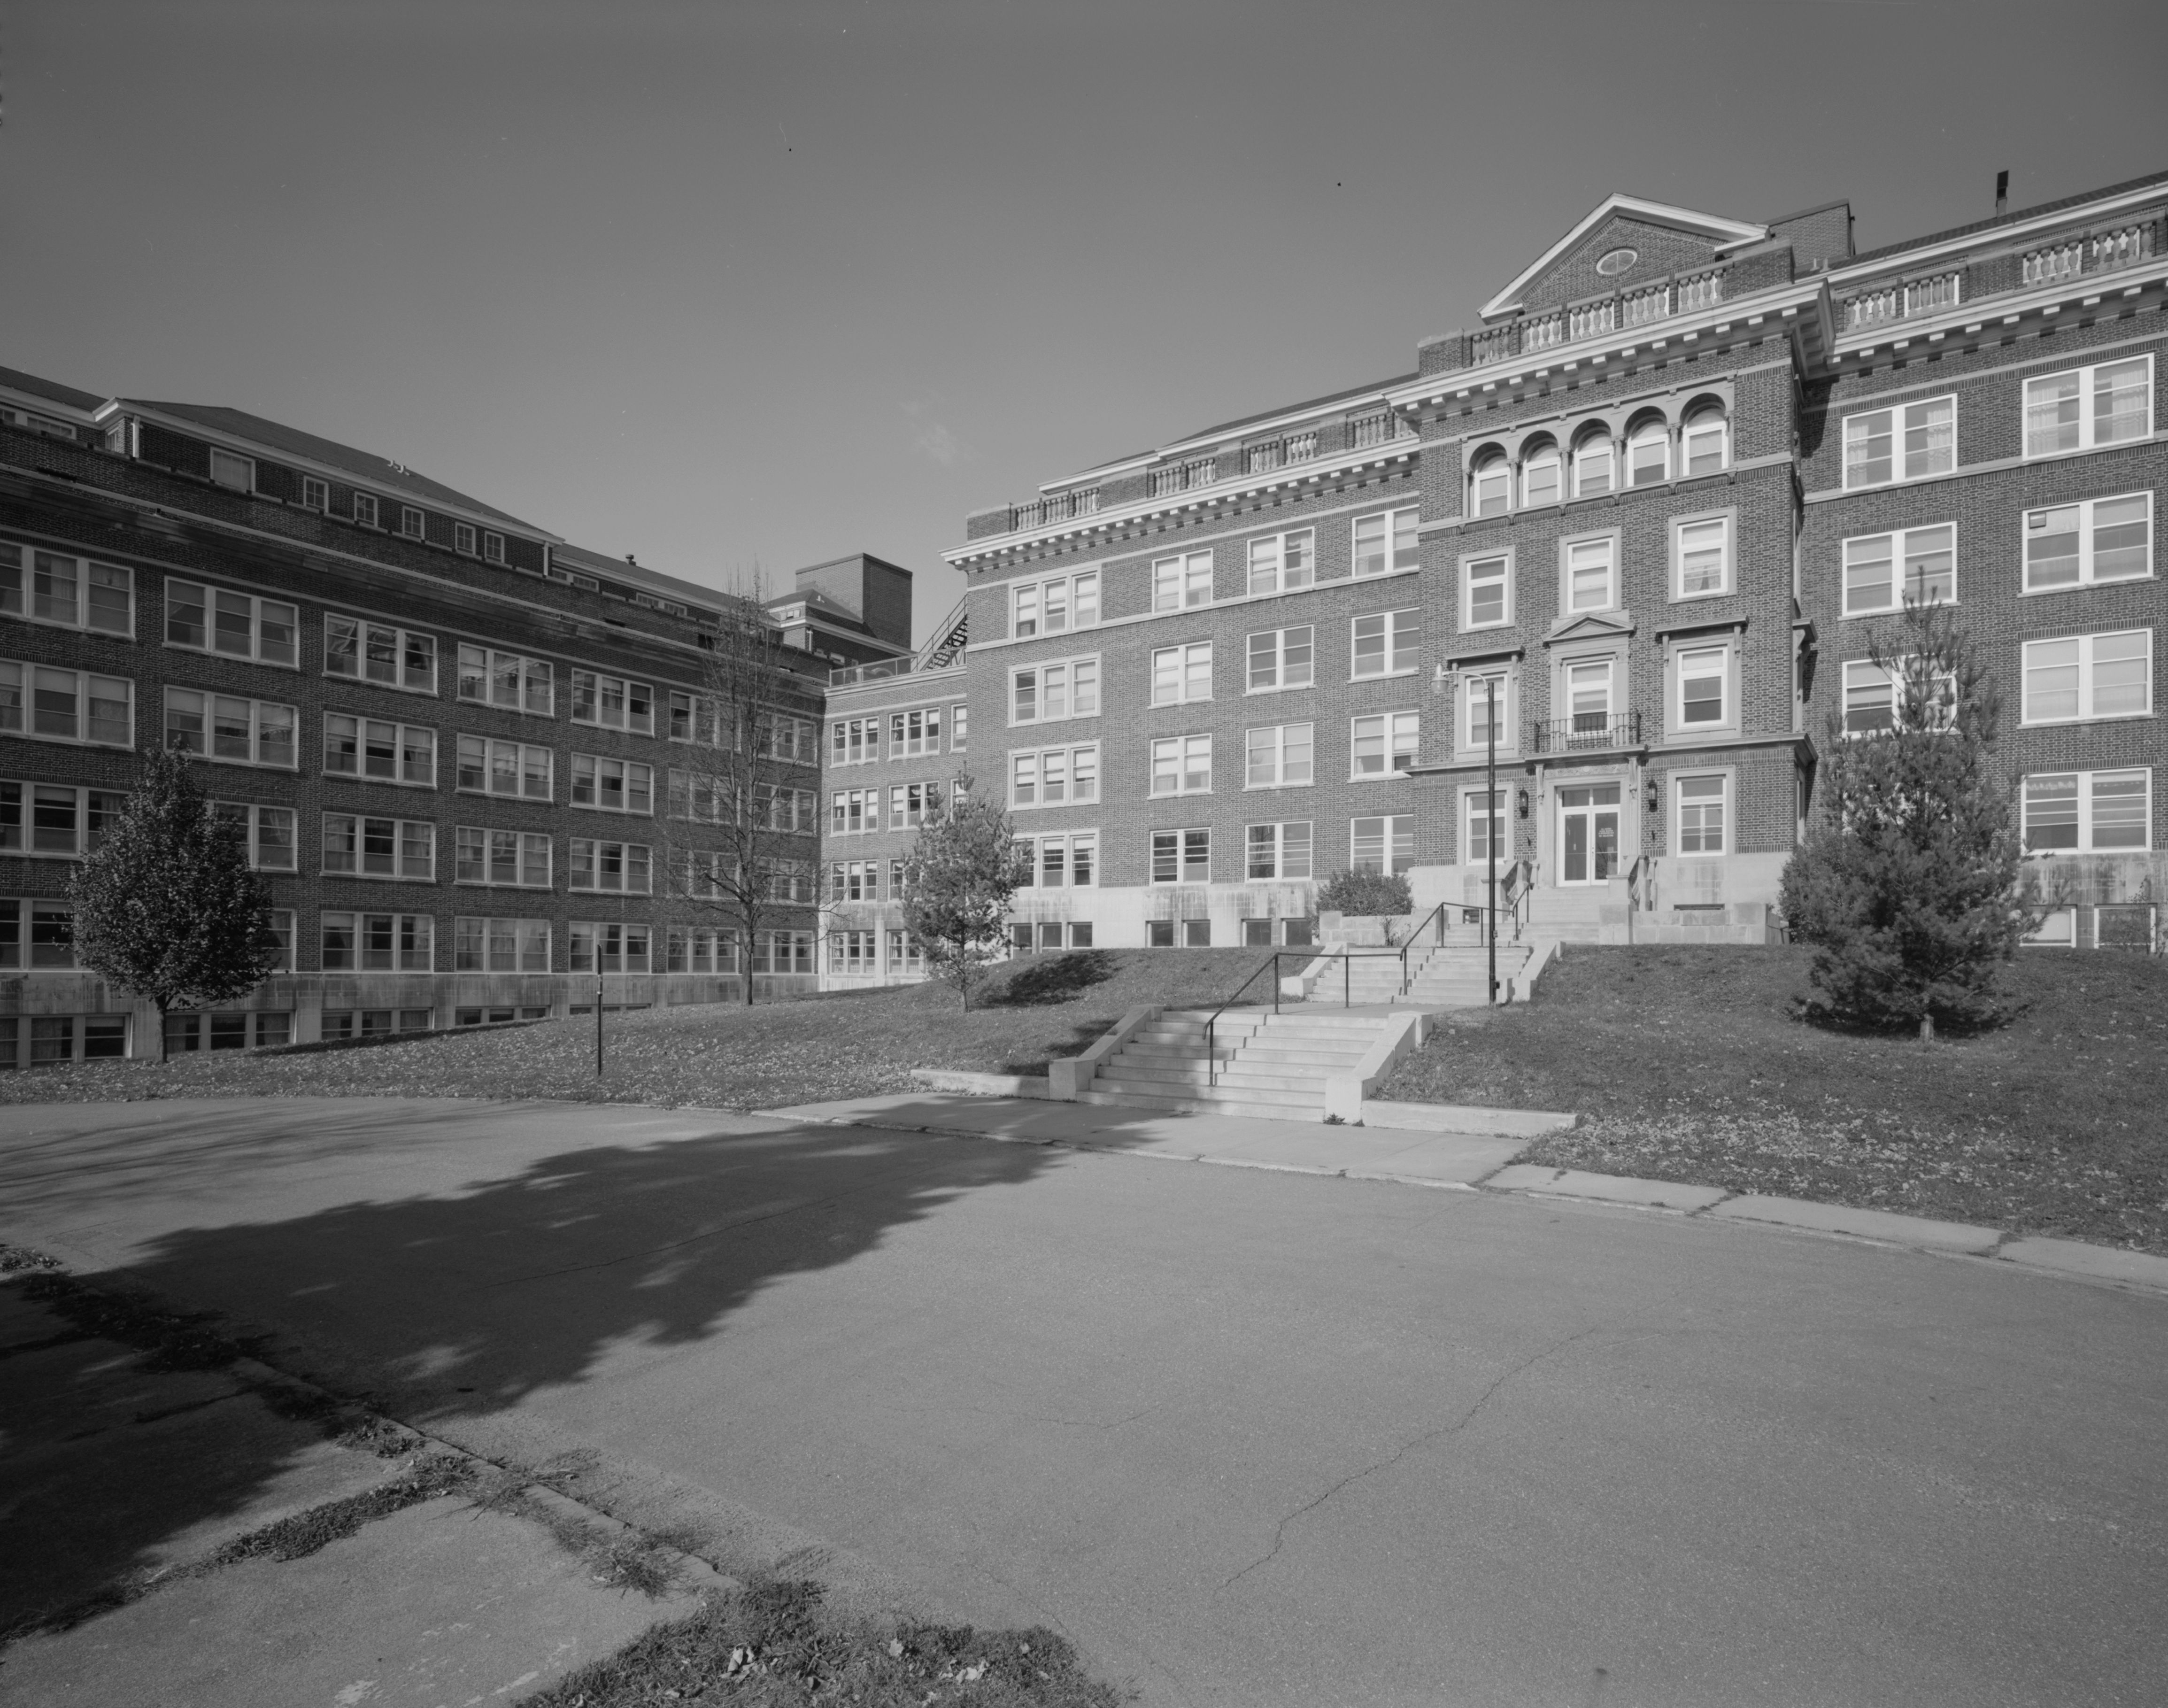 Abandoned Sanatorium Salve Mater in Belgium by Photographer Mooi ...